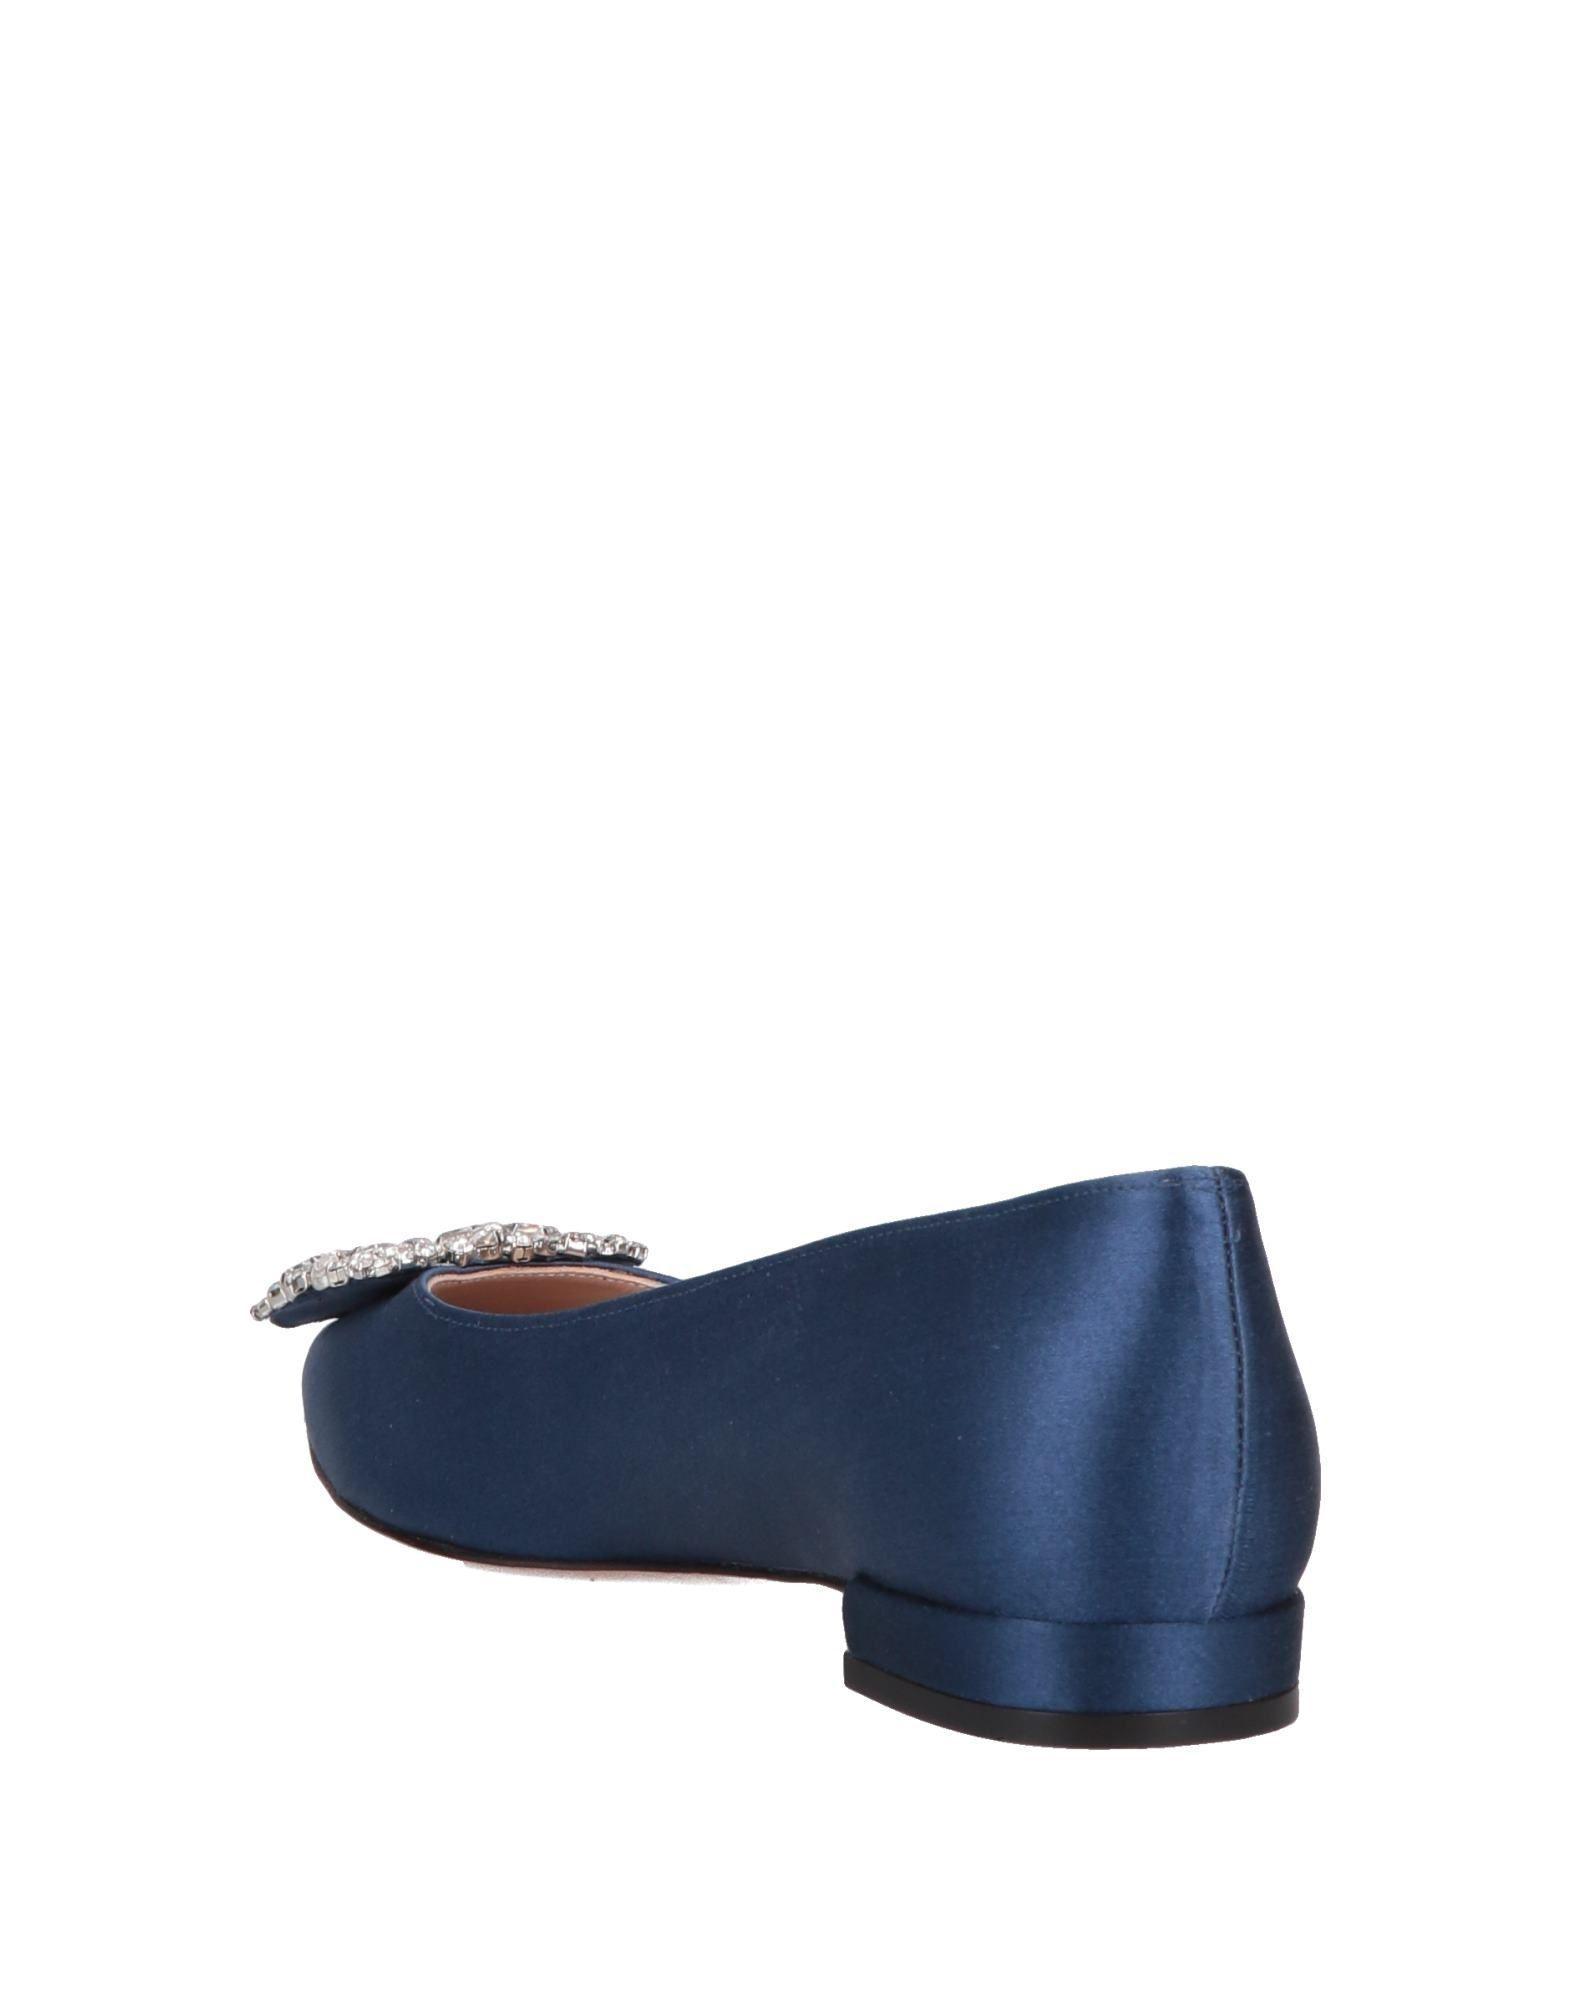 3dd7a15920d Stuart Weitzman Ballet Flats in Blue - Save 1% - Lyst